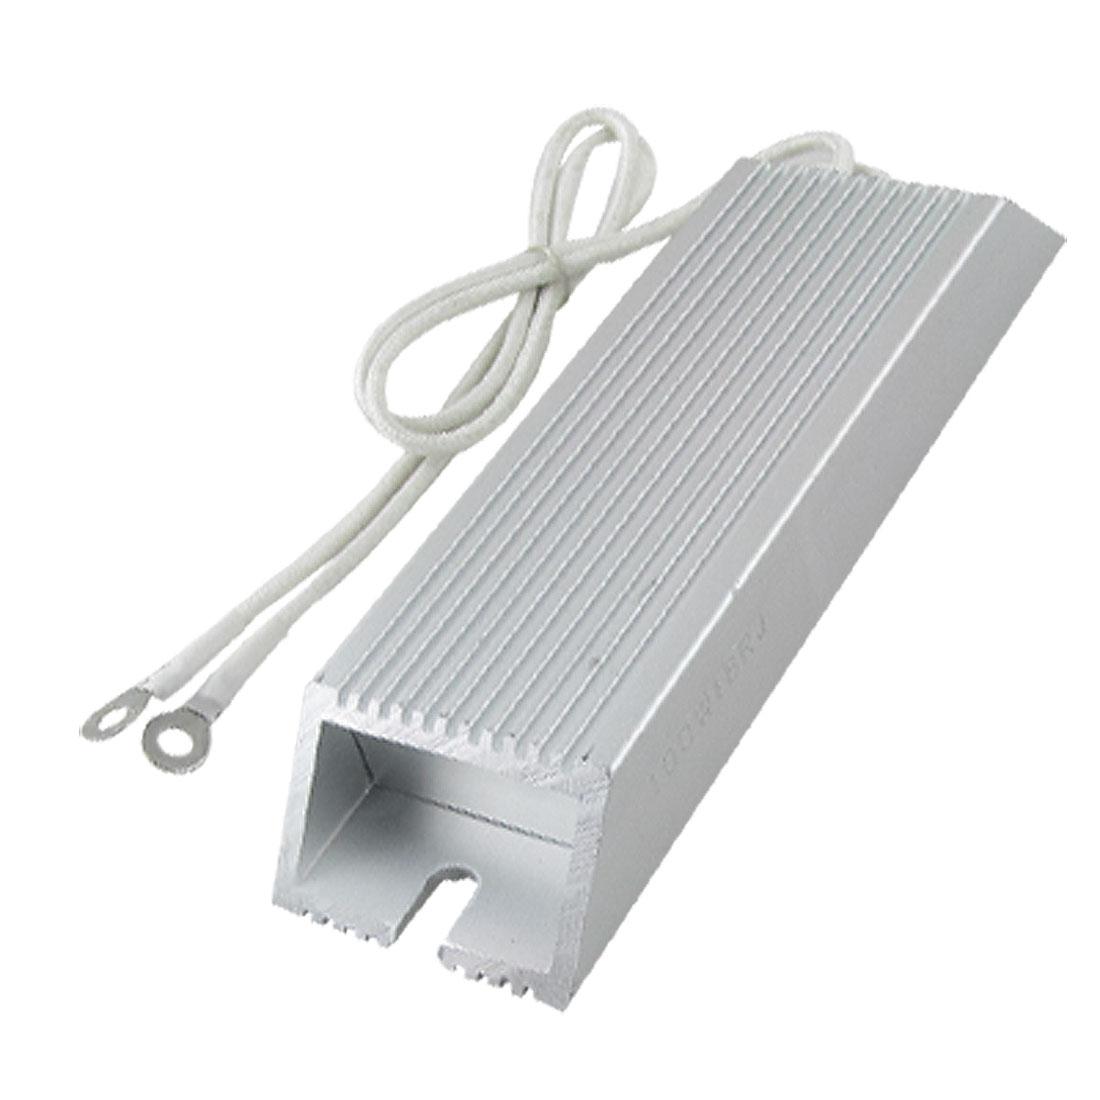 Aluminum Housing Wirewound Braking Resistor 100W 18 ohm